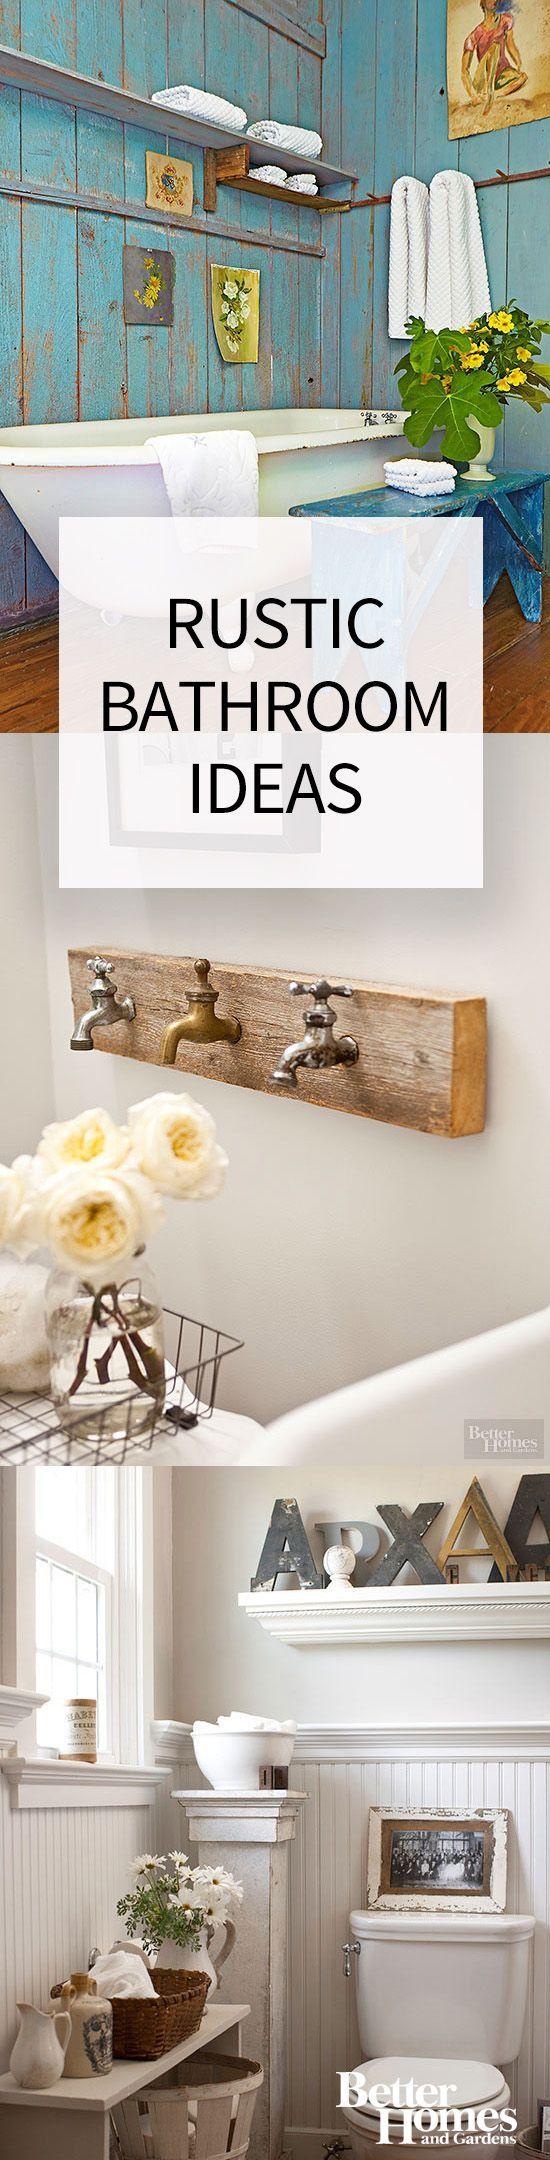 best 25 rustic bathroom designs ideas on pinterest rustic cabin rustic bathroom ideas